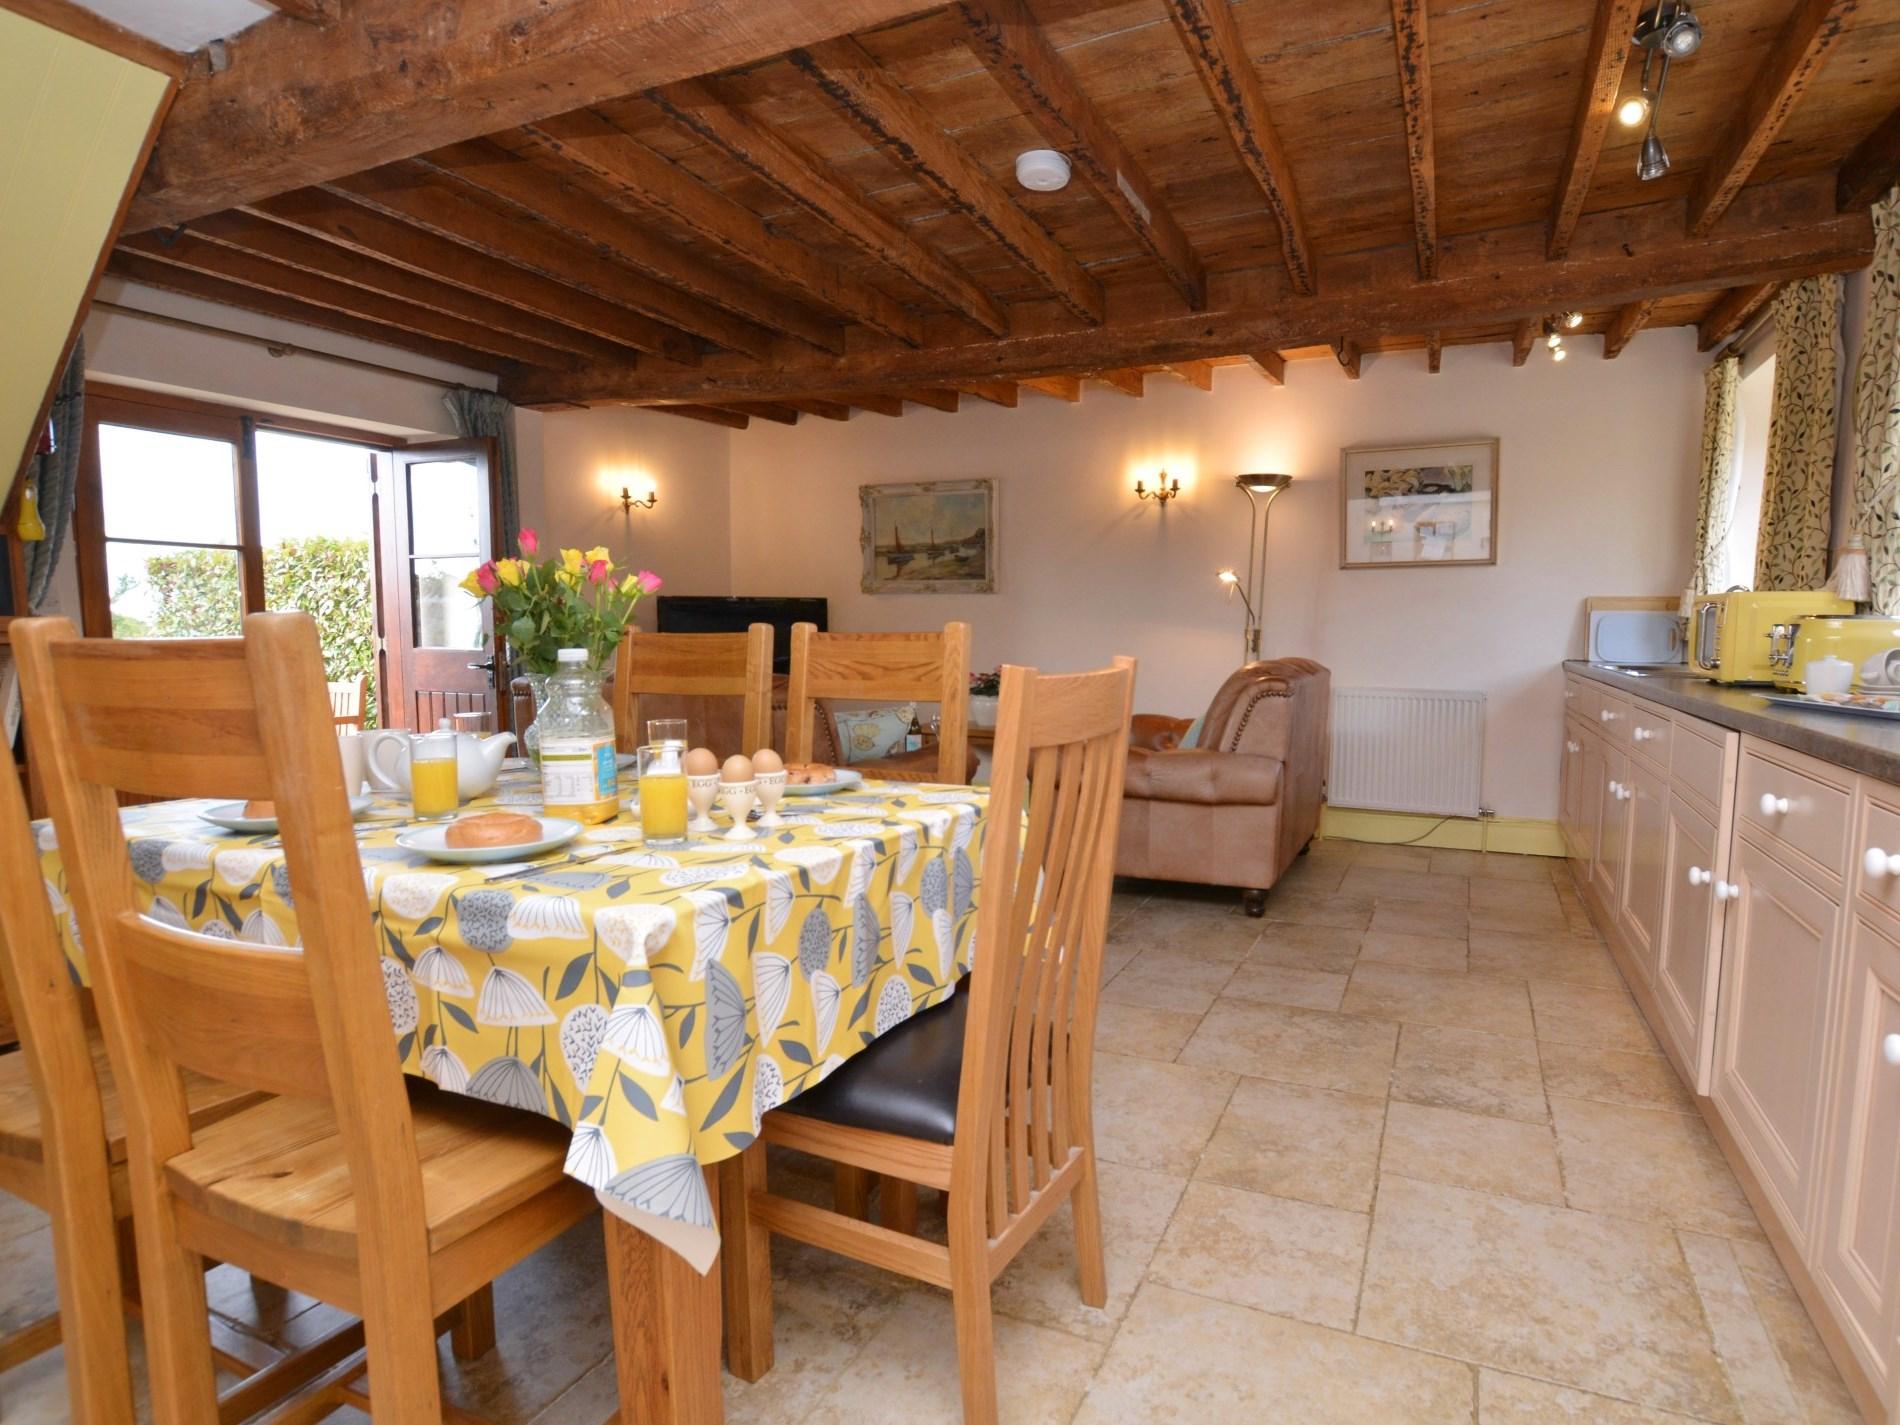 2 Bedroom Cottage in Dorset, Dorset and Somerset